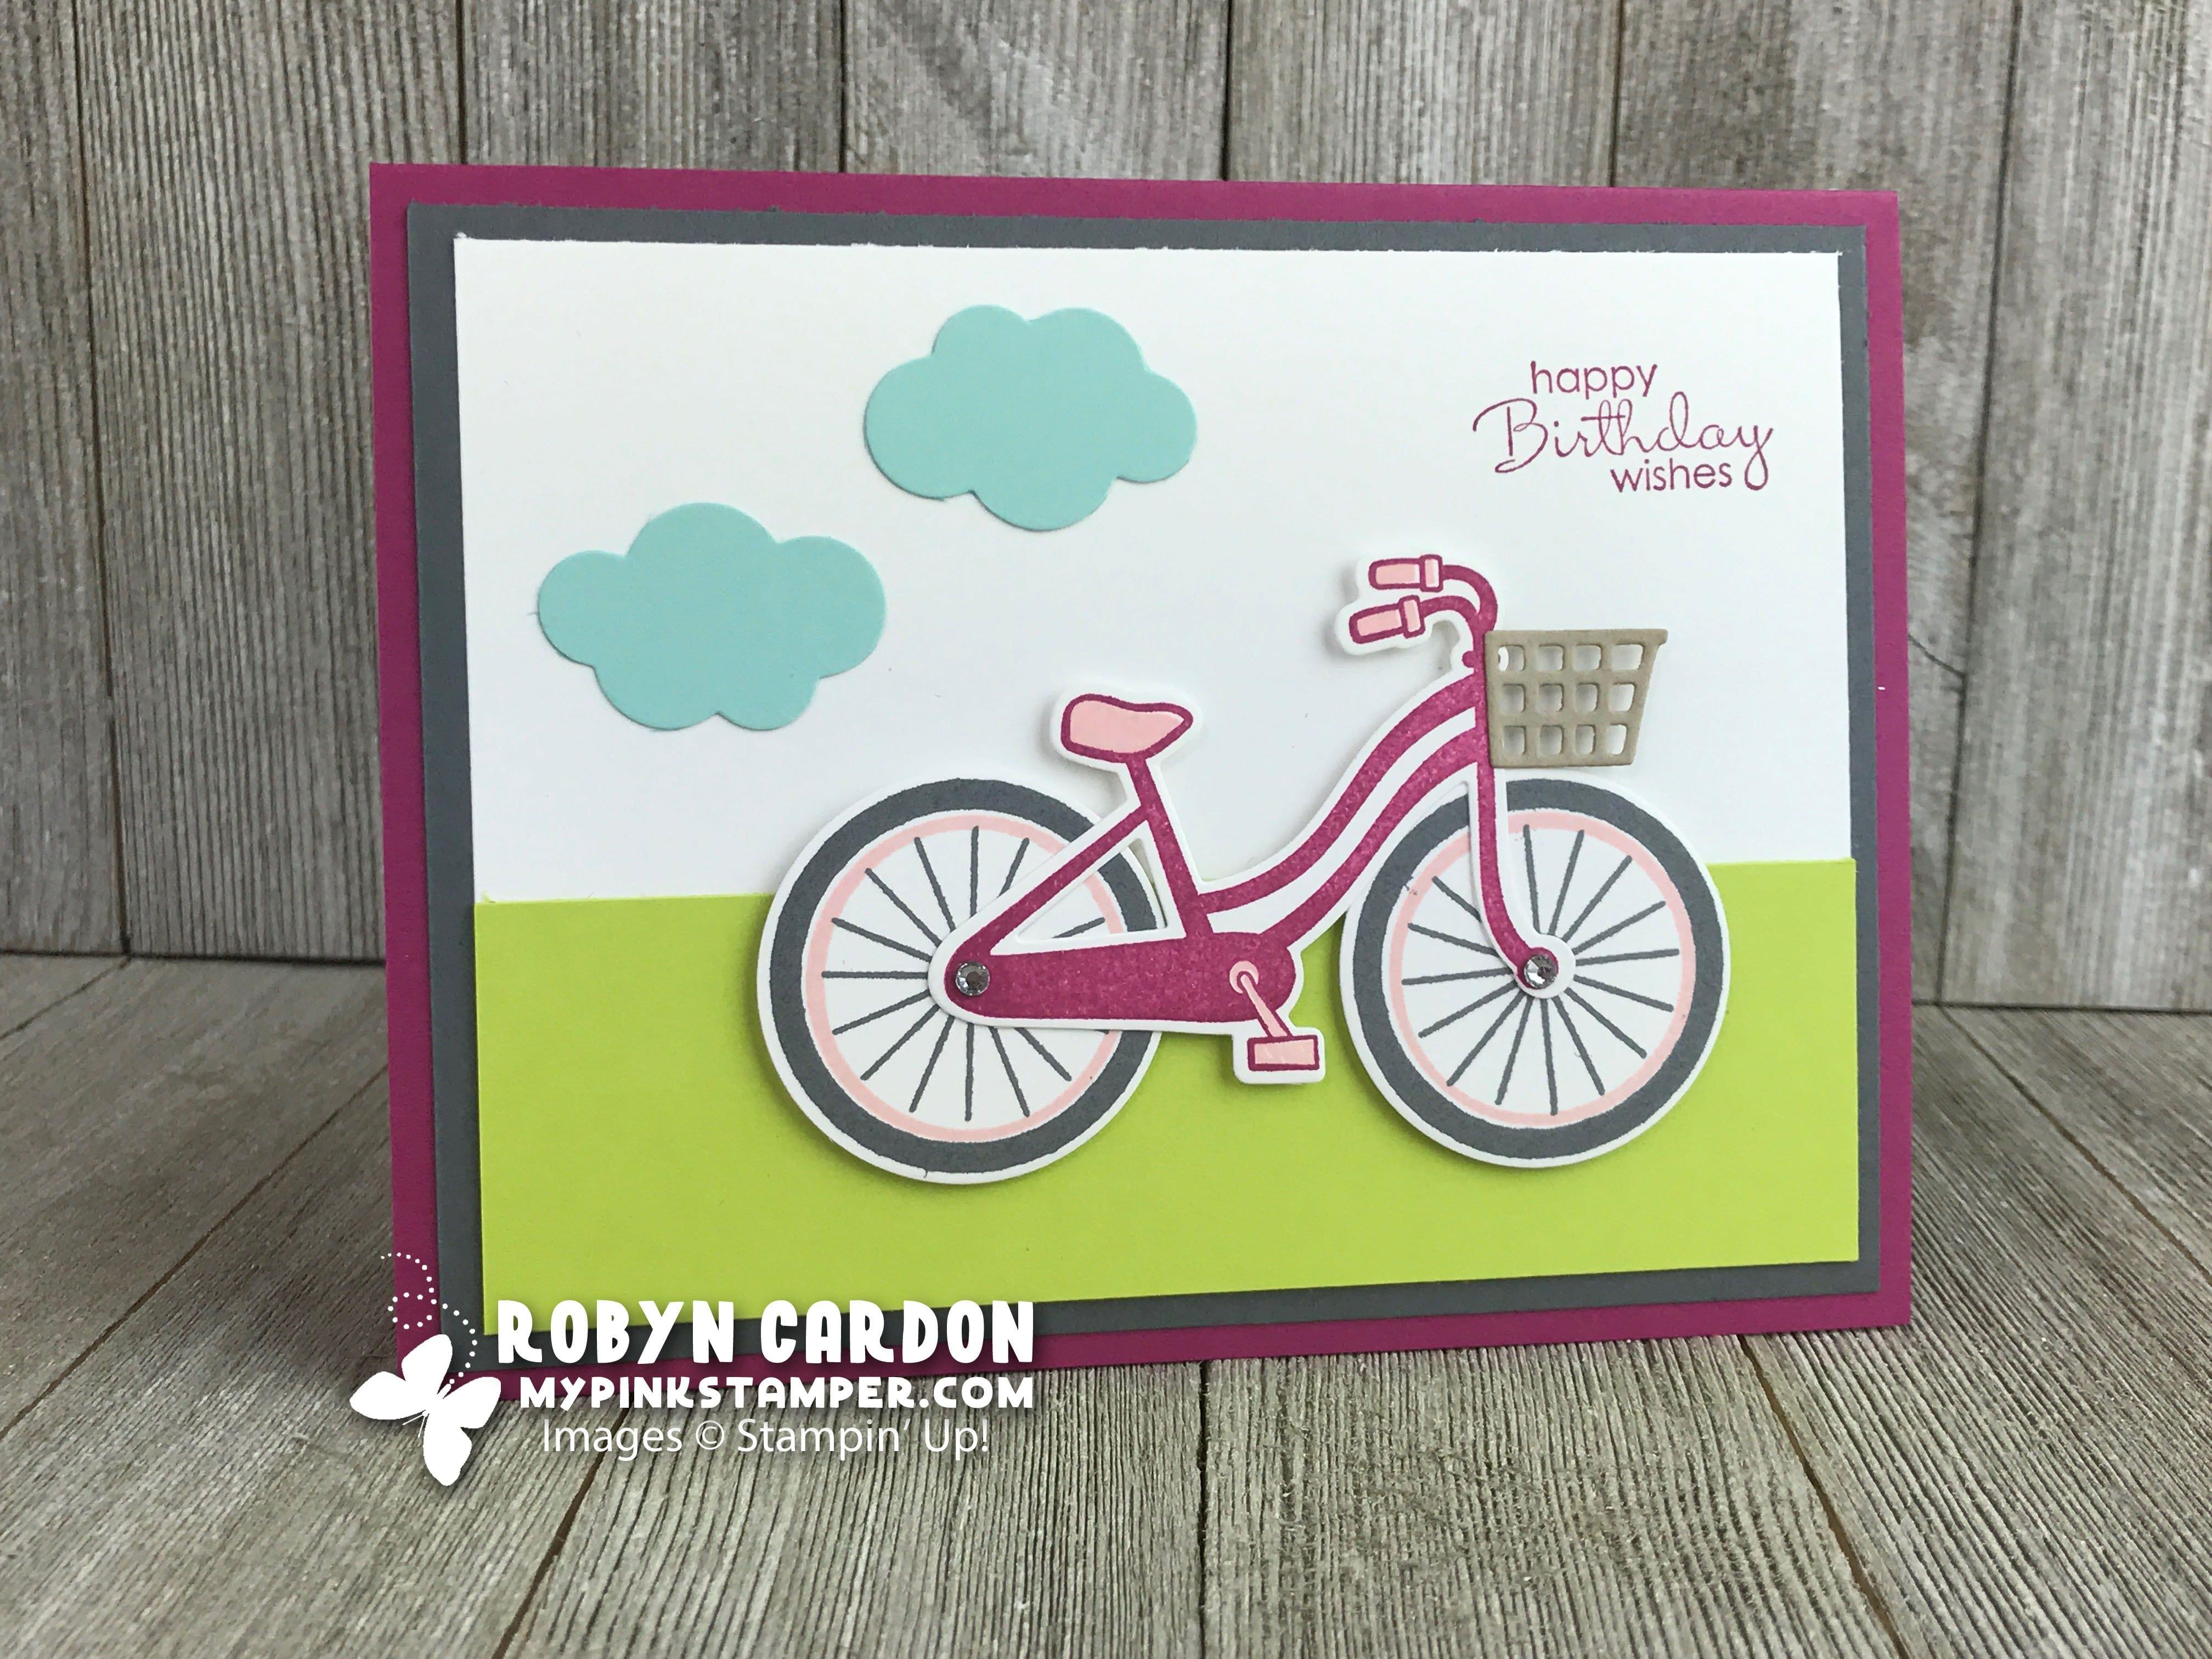 Stampin' Up! Bike Ride Stamp Set Spotlight – Week 2 of Promotion!